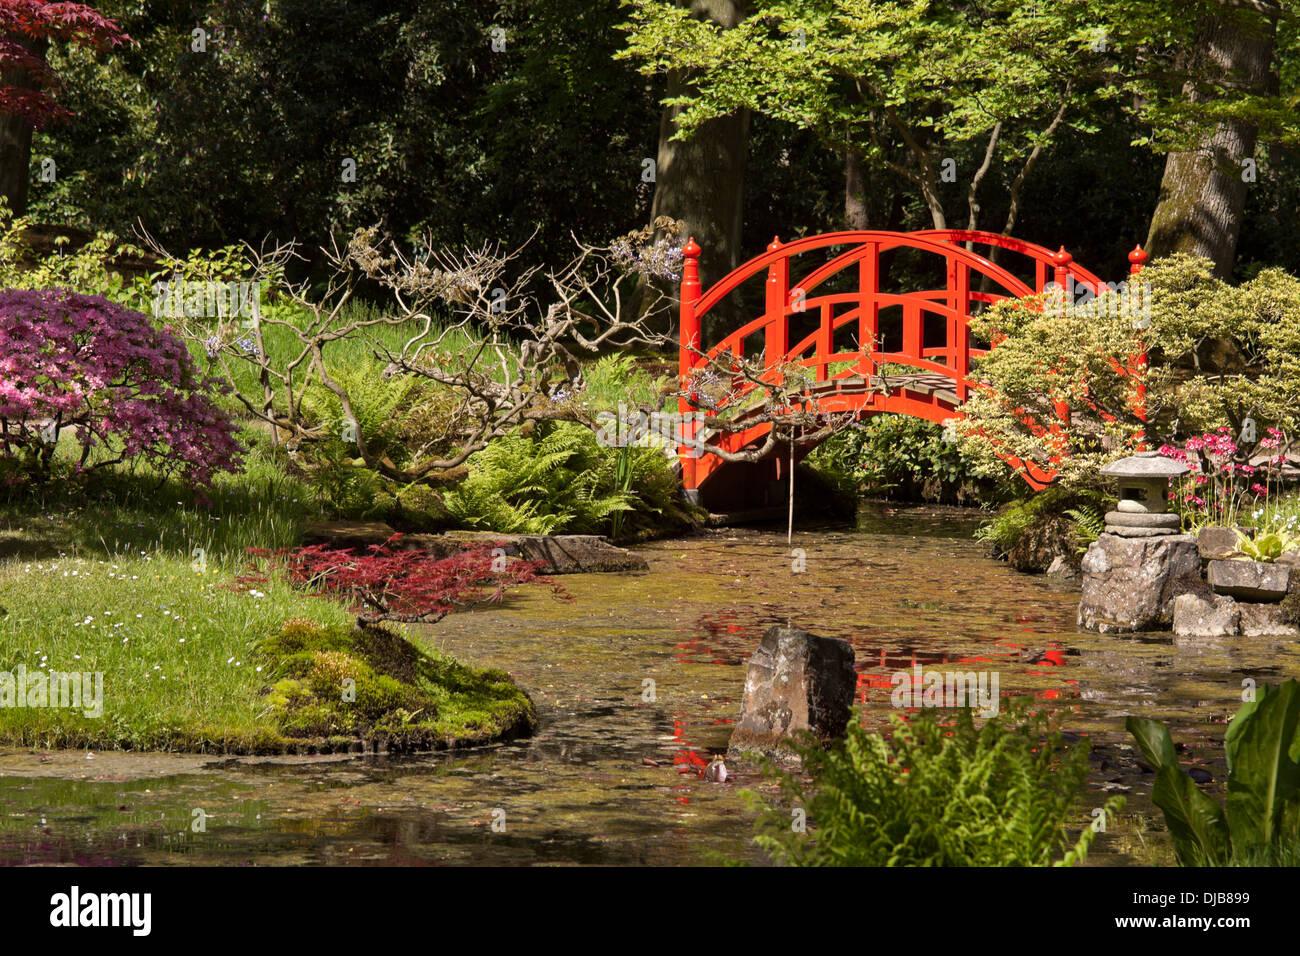 red bridge in the japanese garden at park clingendael den haag the hague